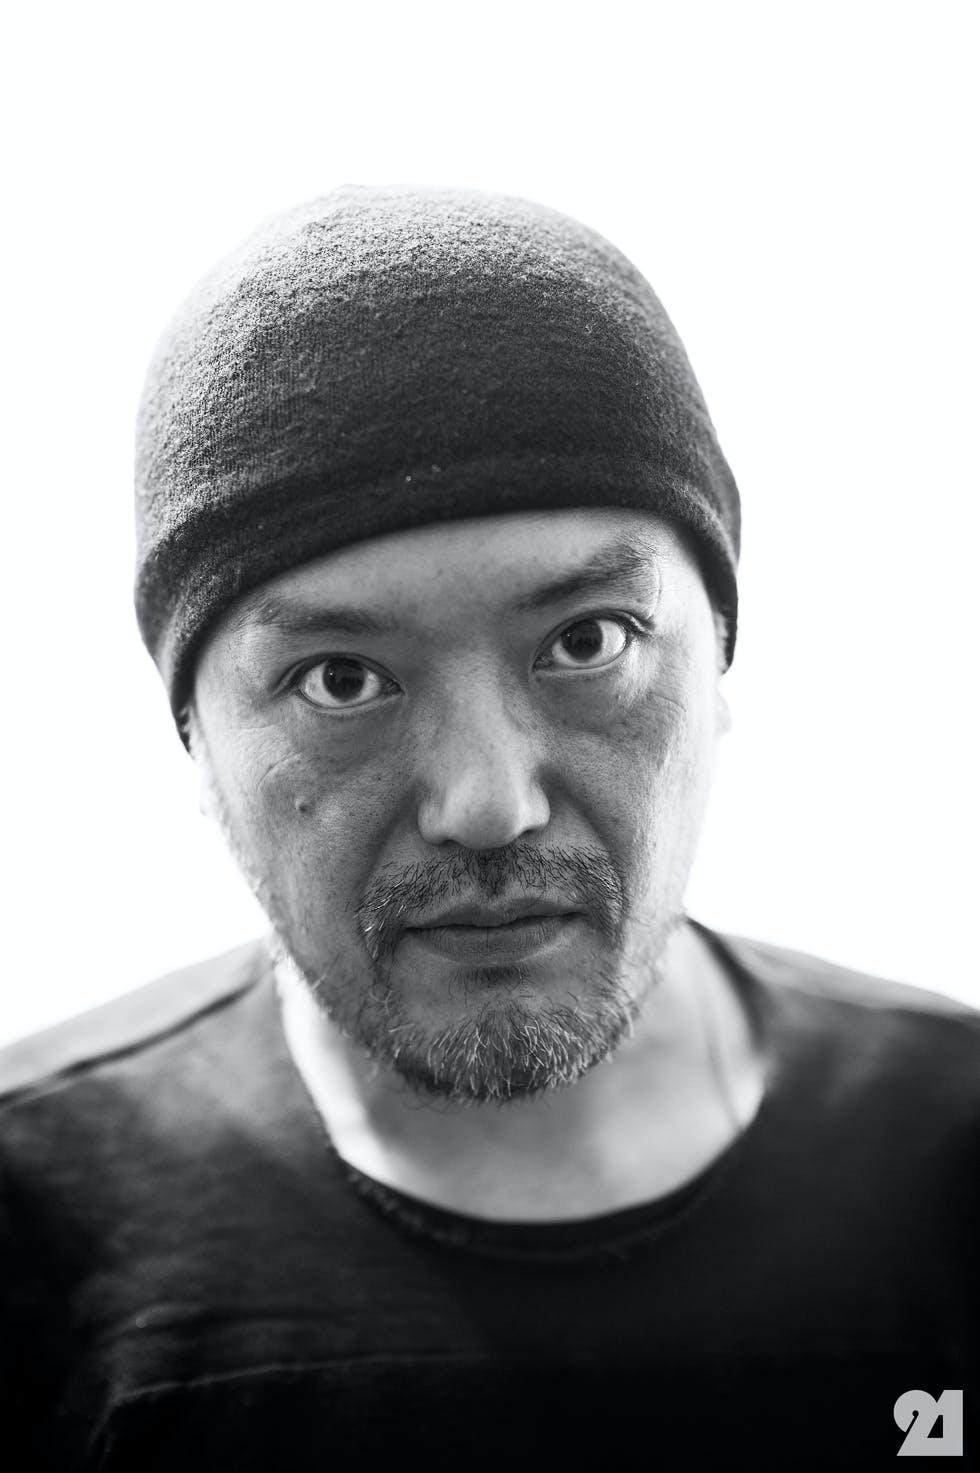 TATSURO HORIKAWA (JULIUS), DESIGNER PROFILE